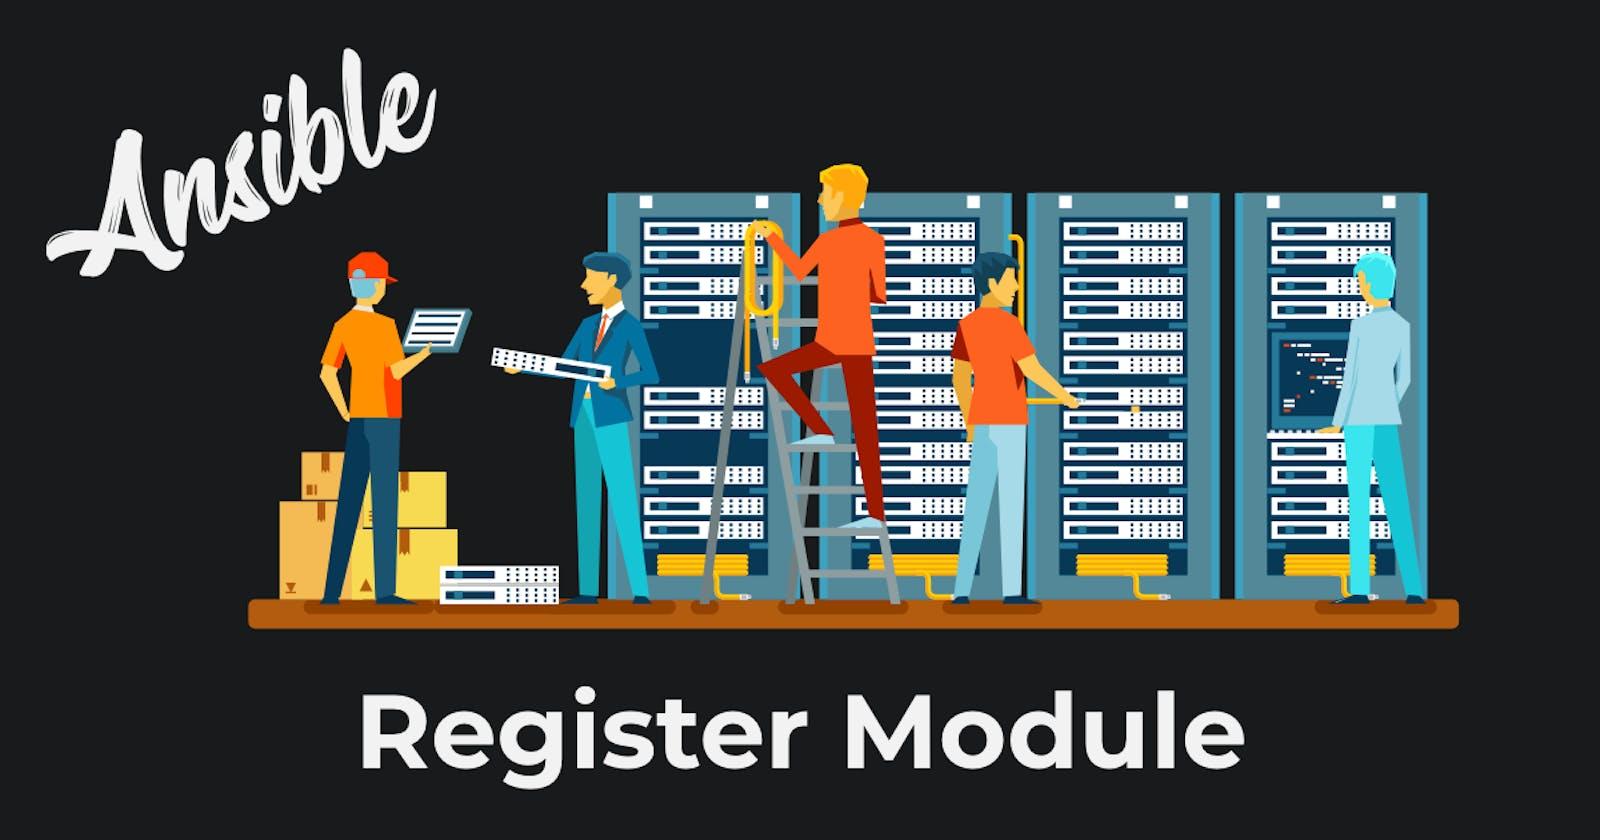 Ansible Register Module